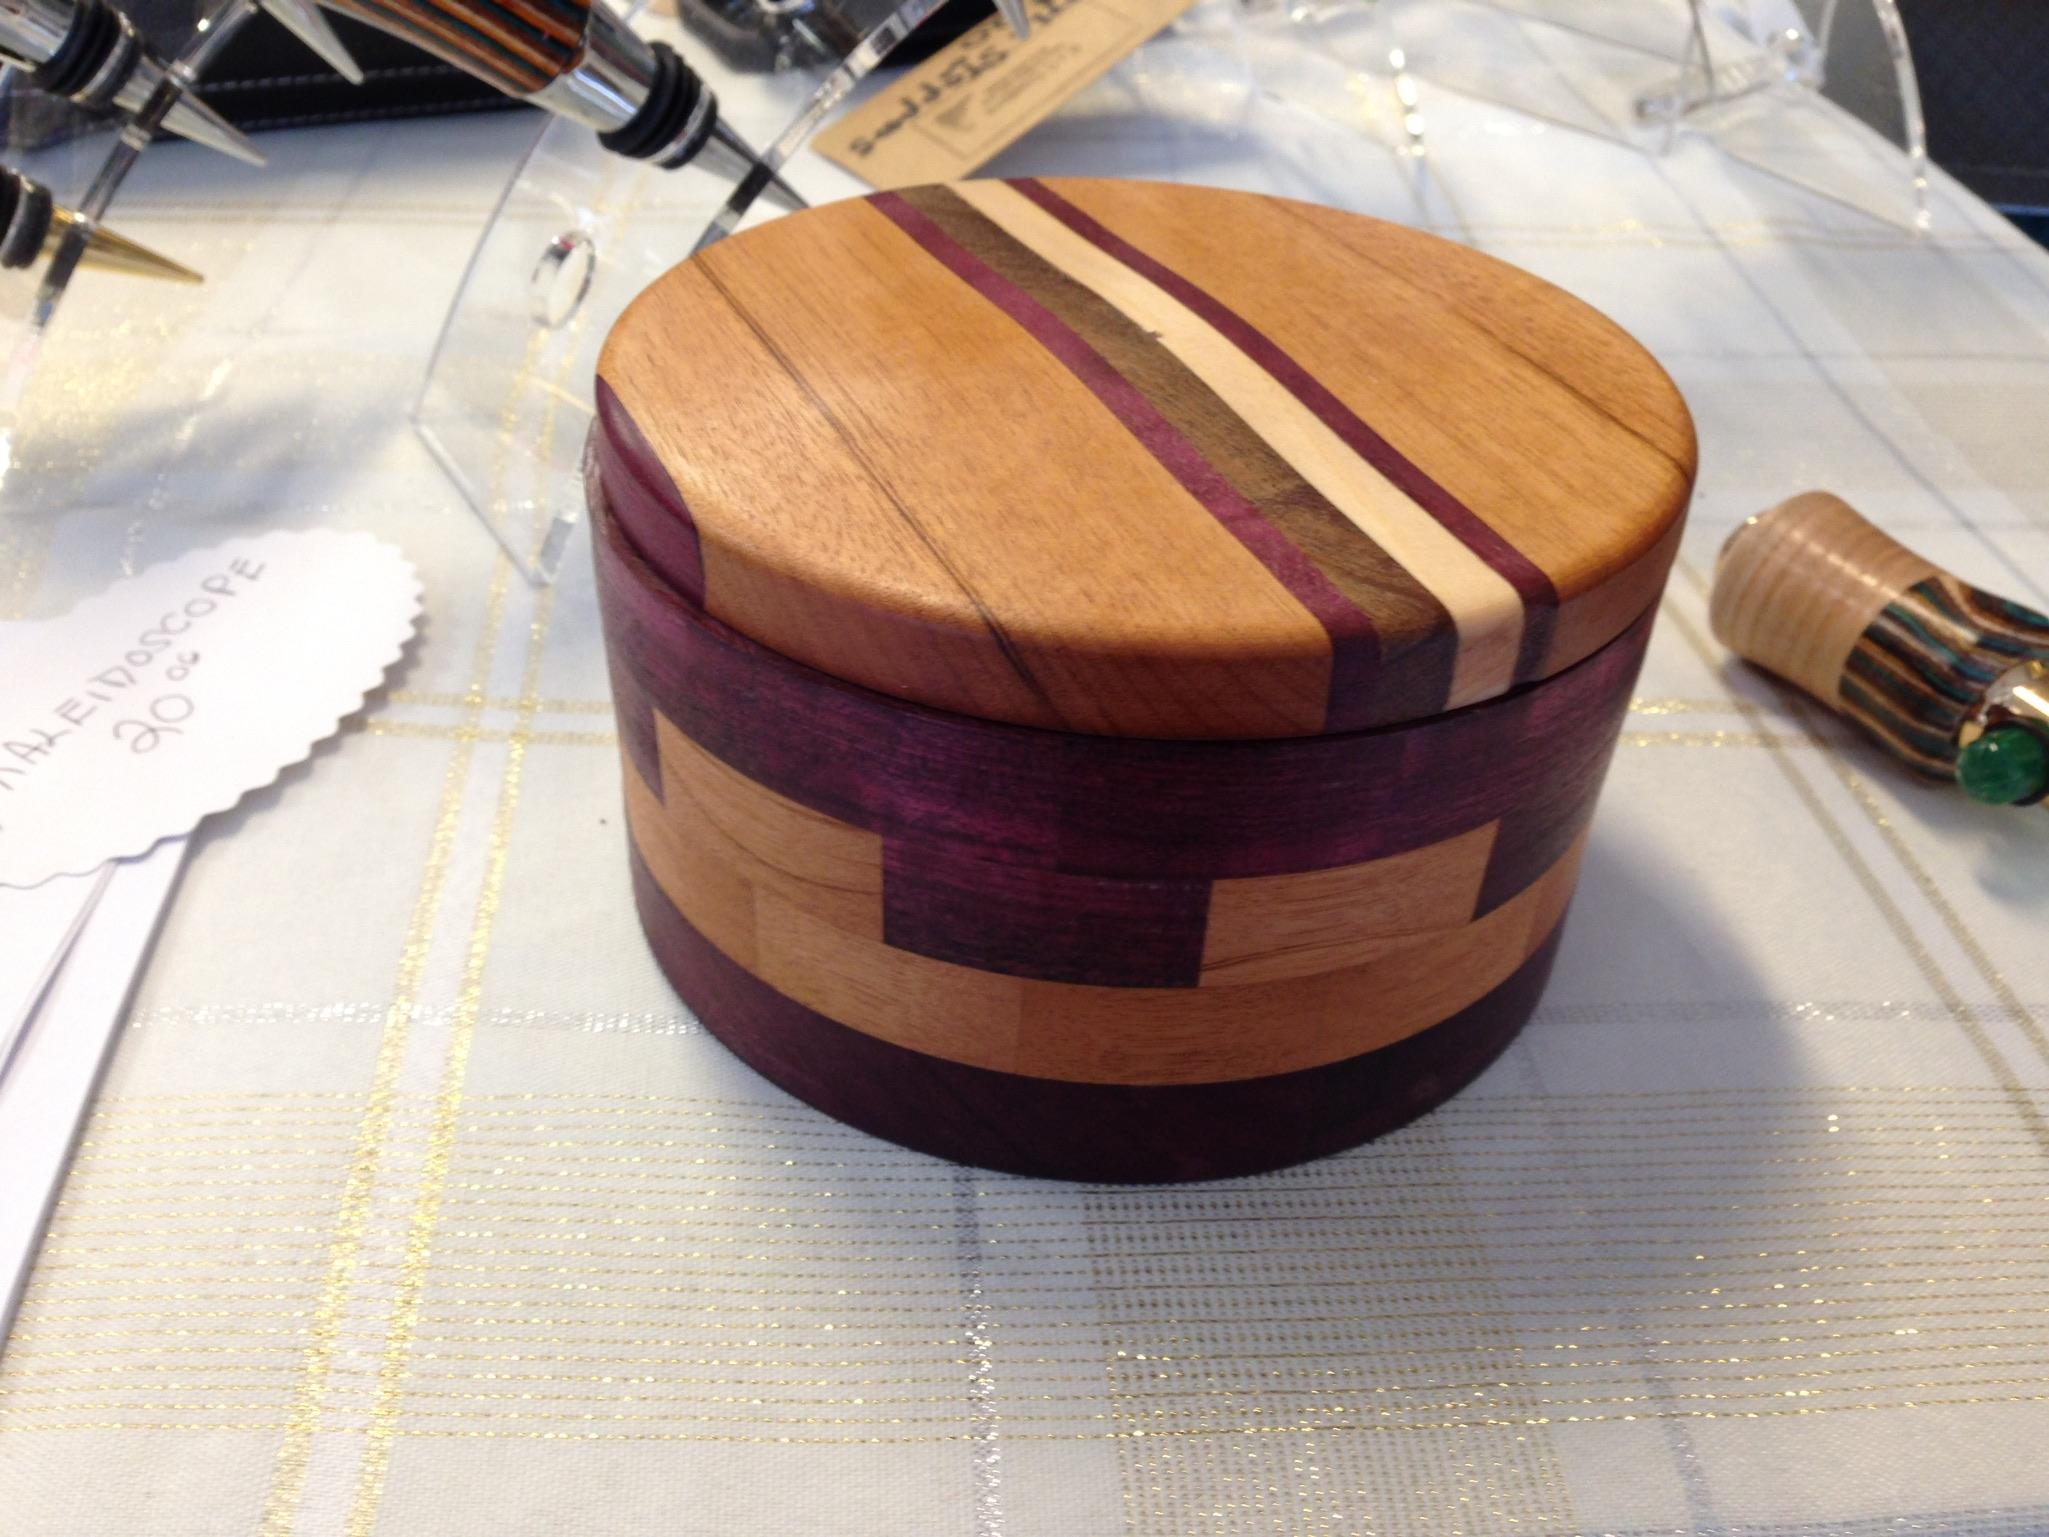 RJC Wood Creations - Bowls (54).jpg